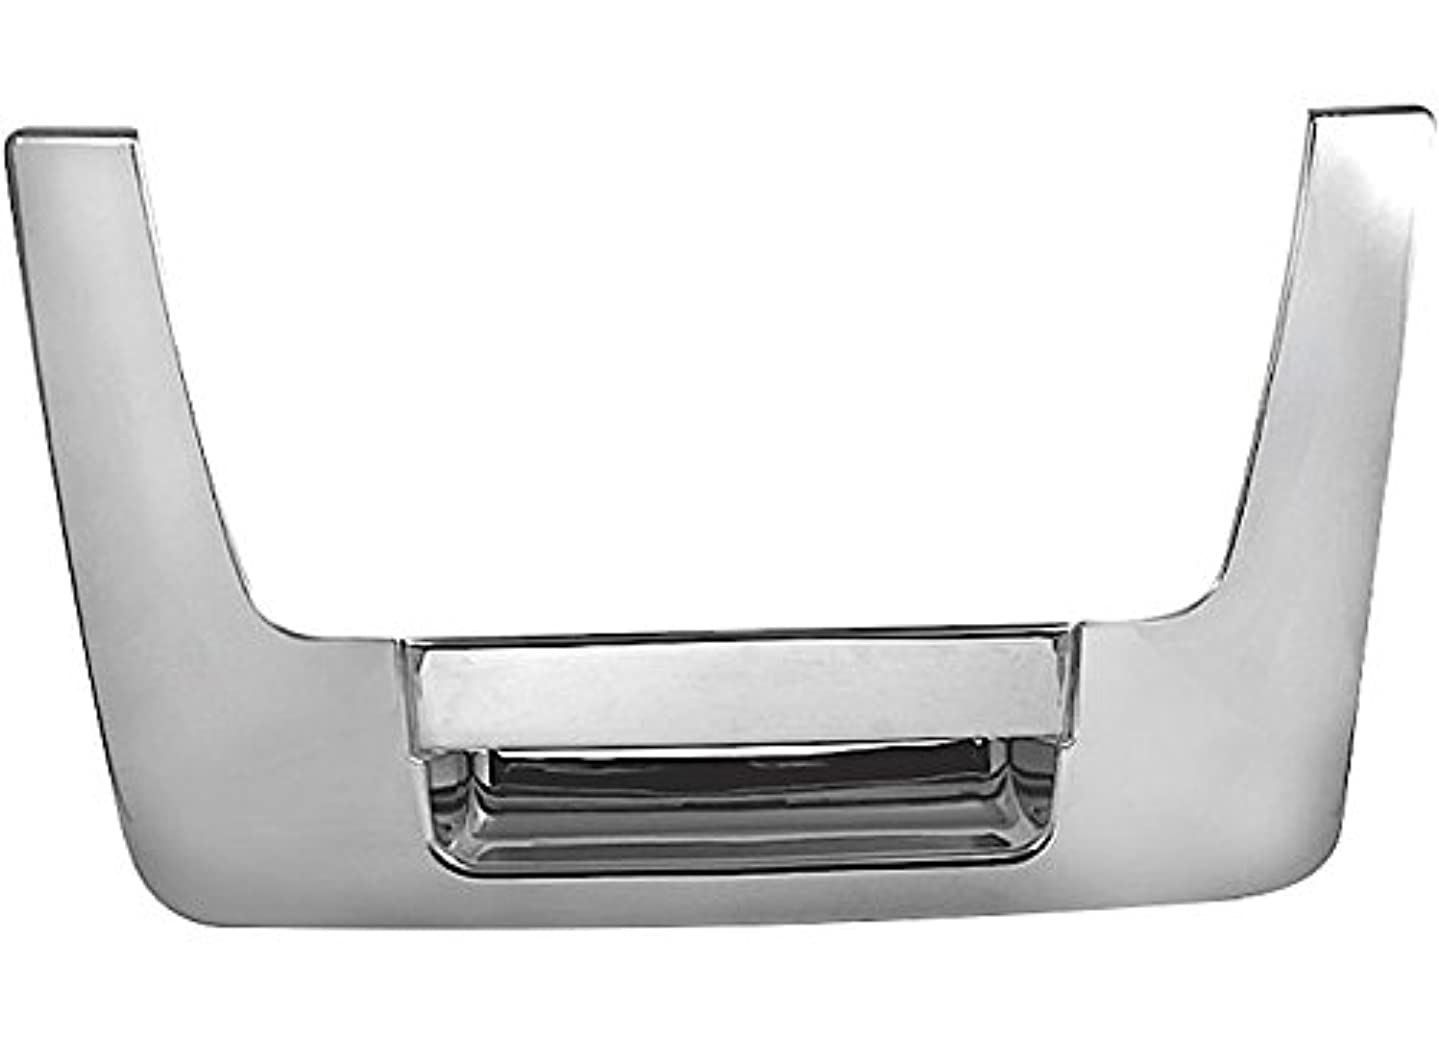 Brite Chrome (17107) Tailgate Handle Cover, Chrome